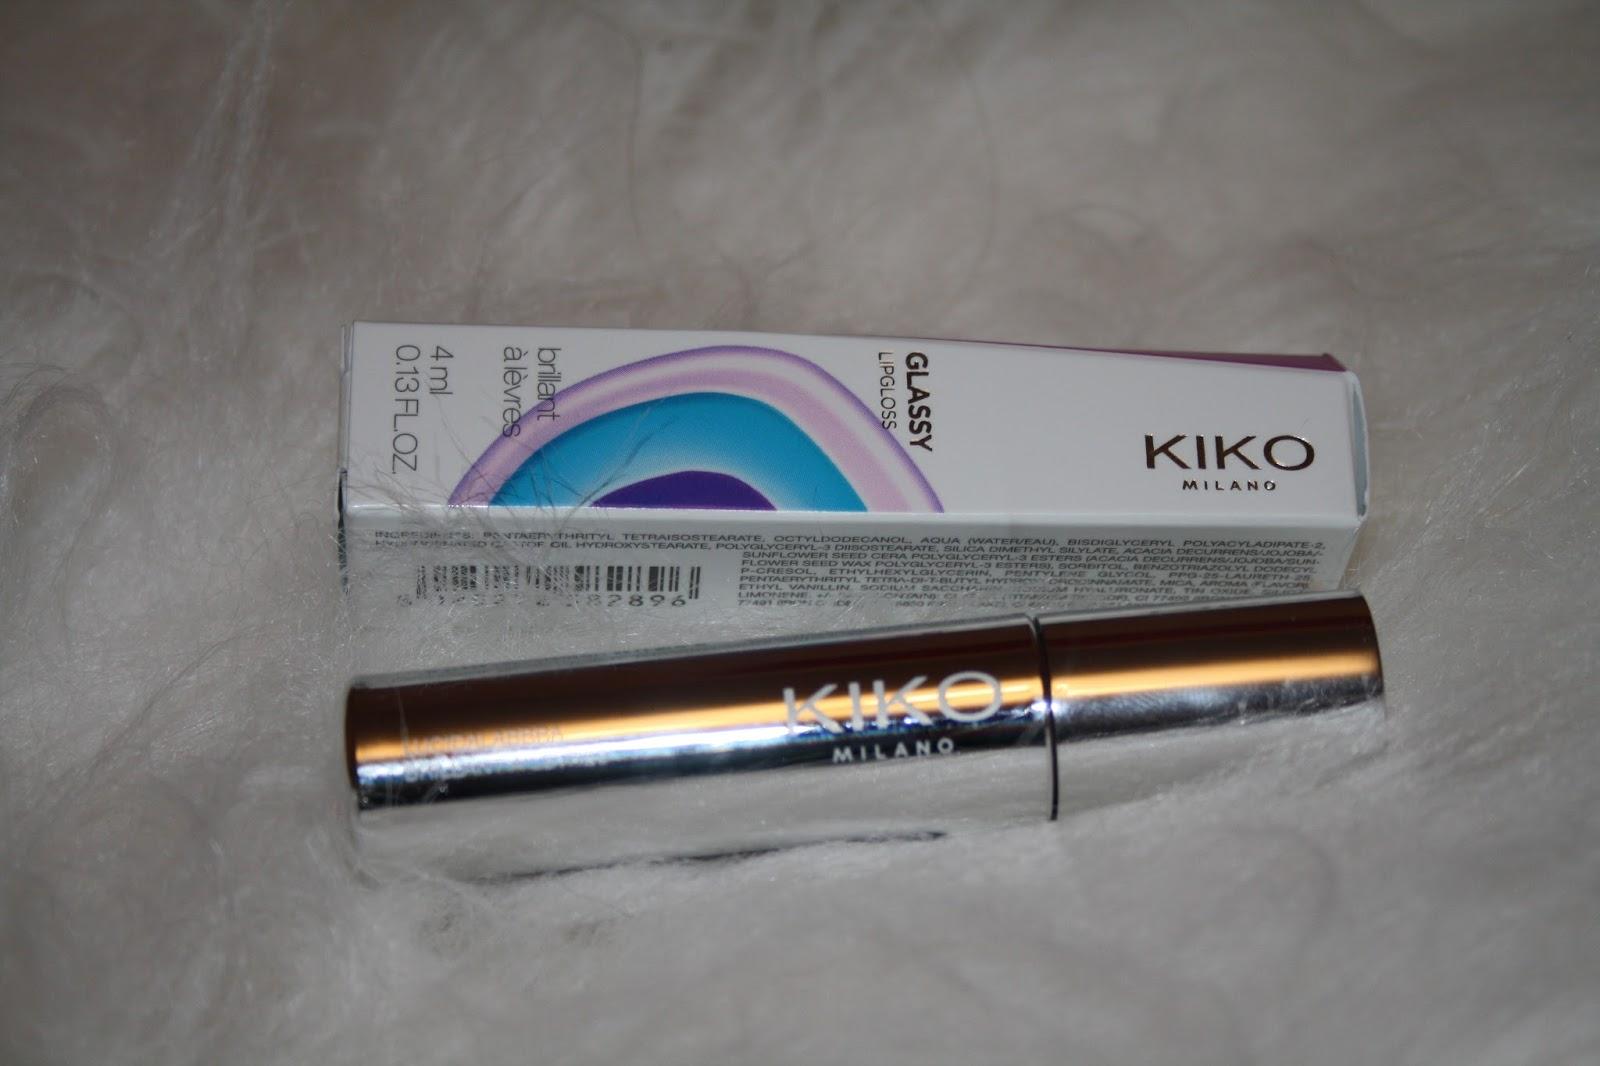 KIKO Glassy Lipgloss